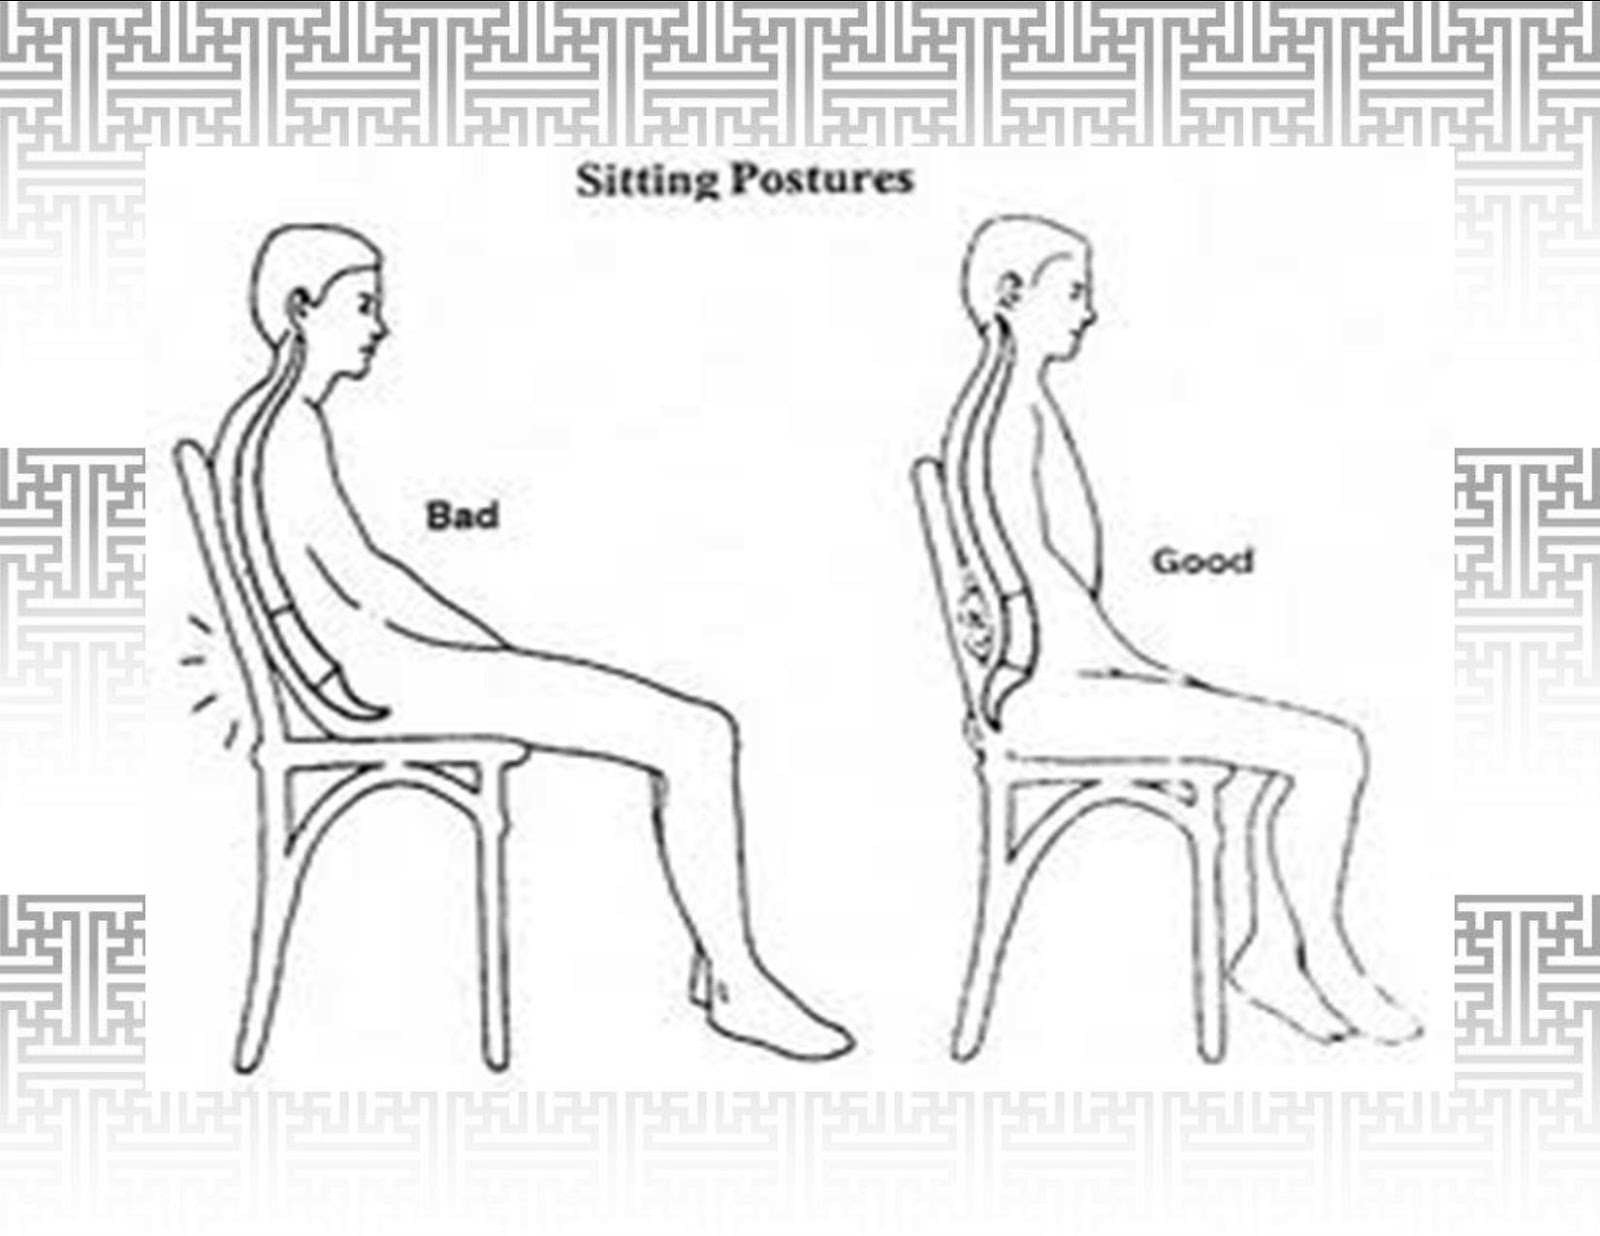 Posture Chair Sitting Large Swivel Chairs Living Room Wellscript Llc 11 Great Benefits Of Having Good